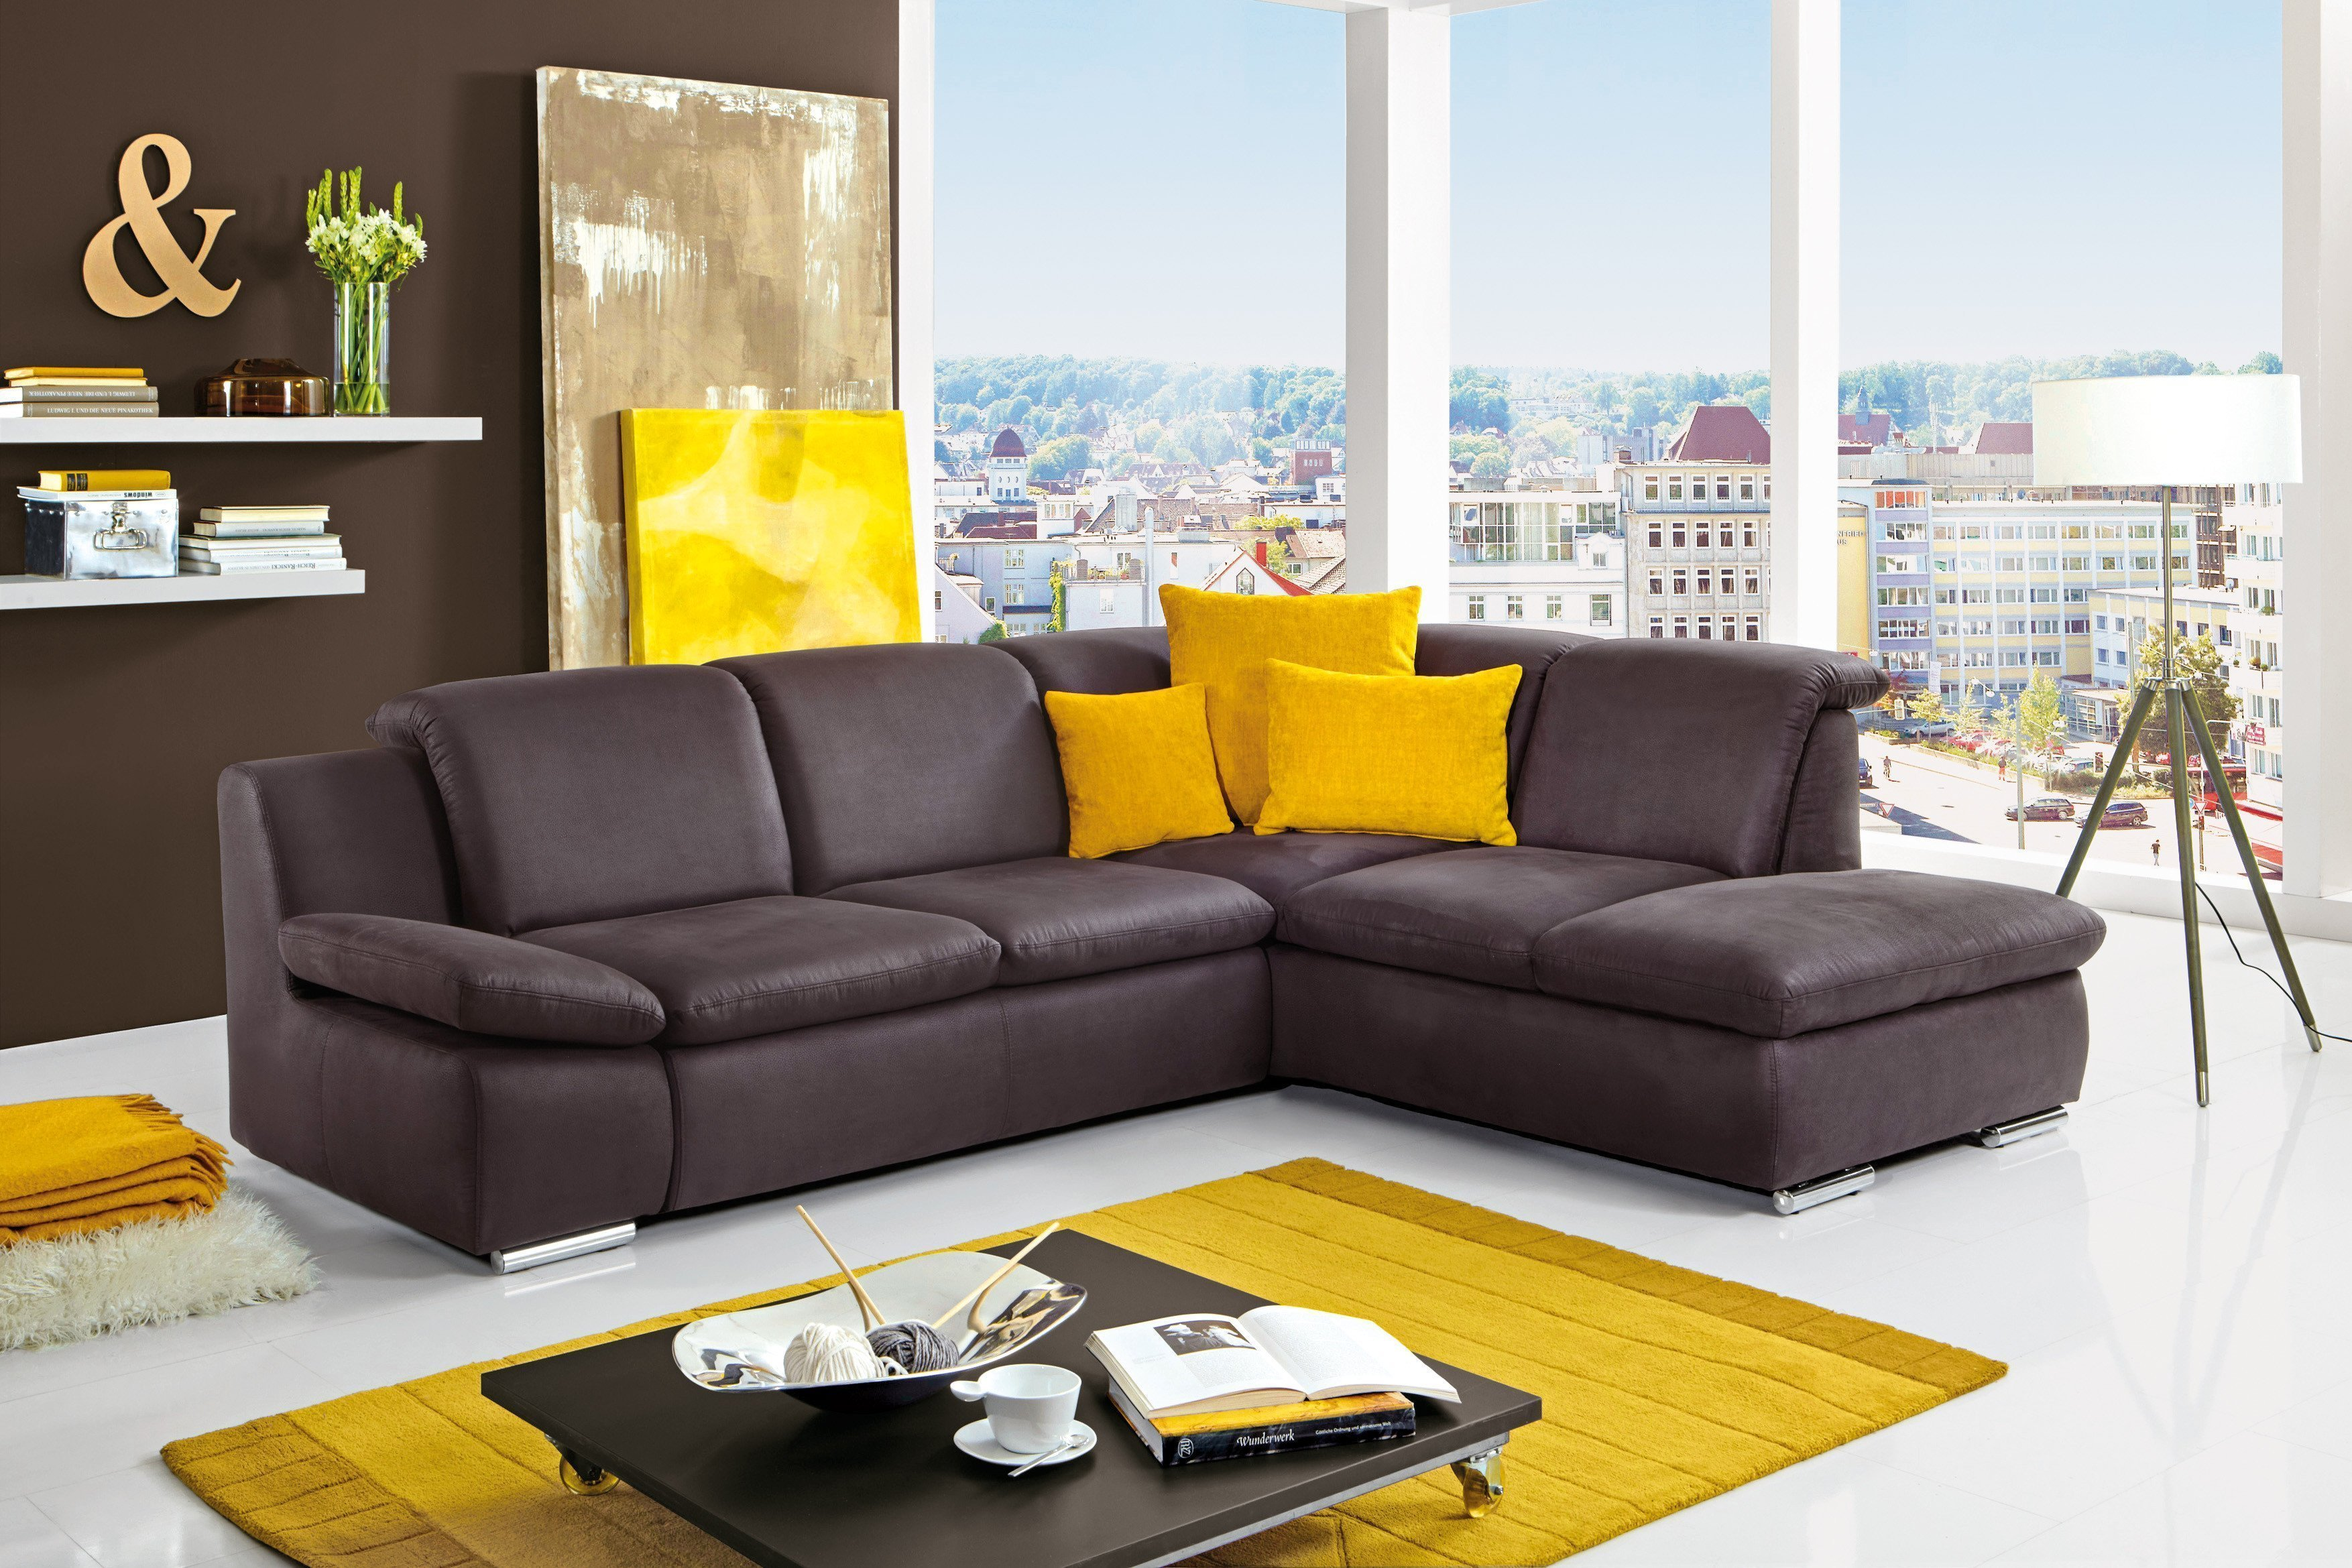 isona von poco ecksofa anthrazit polsterm bel g nstig. Black Bedroom Furniture Sets. Home Design Ideas